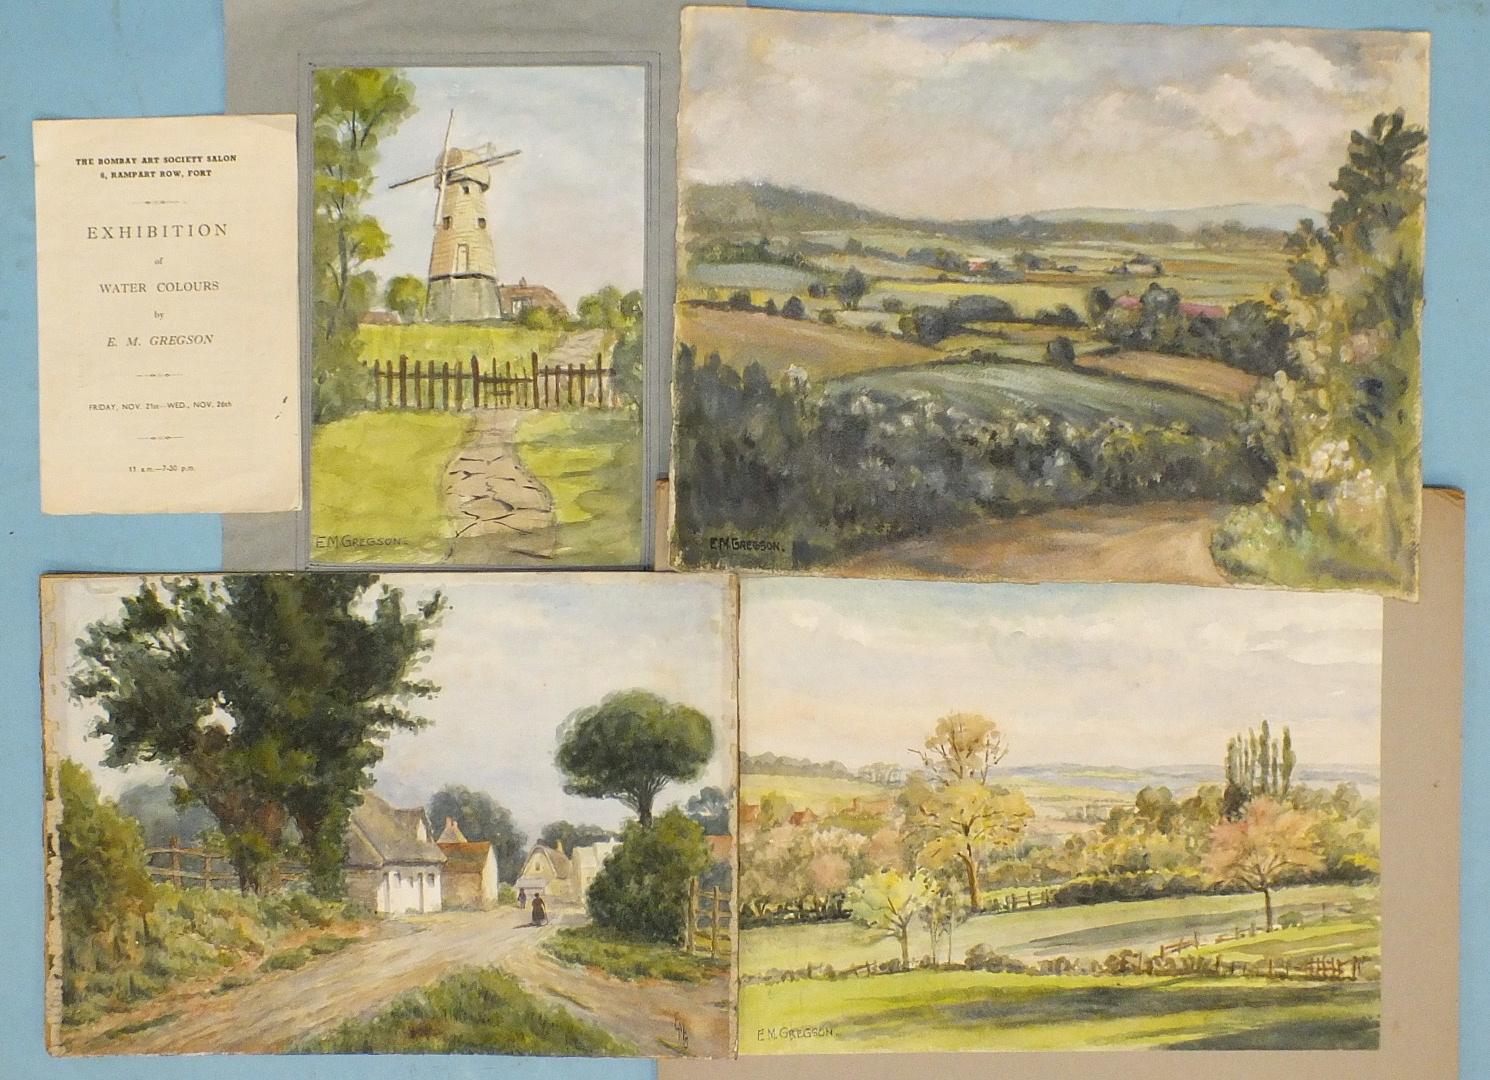 Lot 29 - E M Gregson, a book of watercolour sketches of Indian landscapes, including Bandadara, Srinagar,